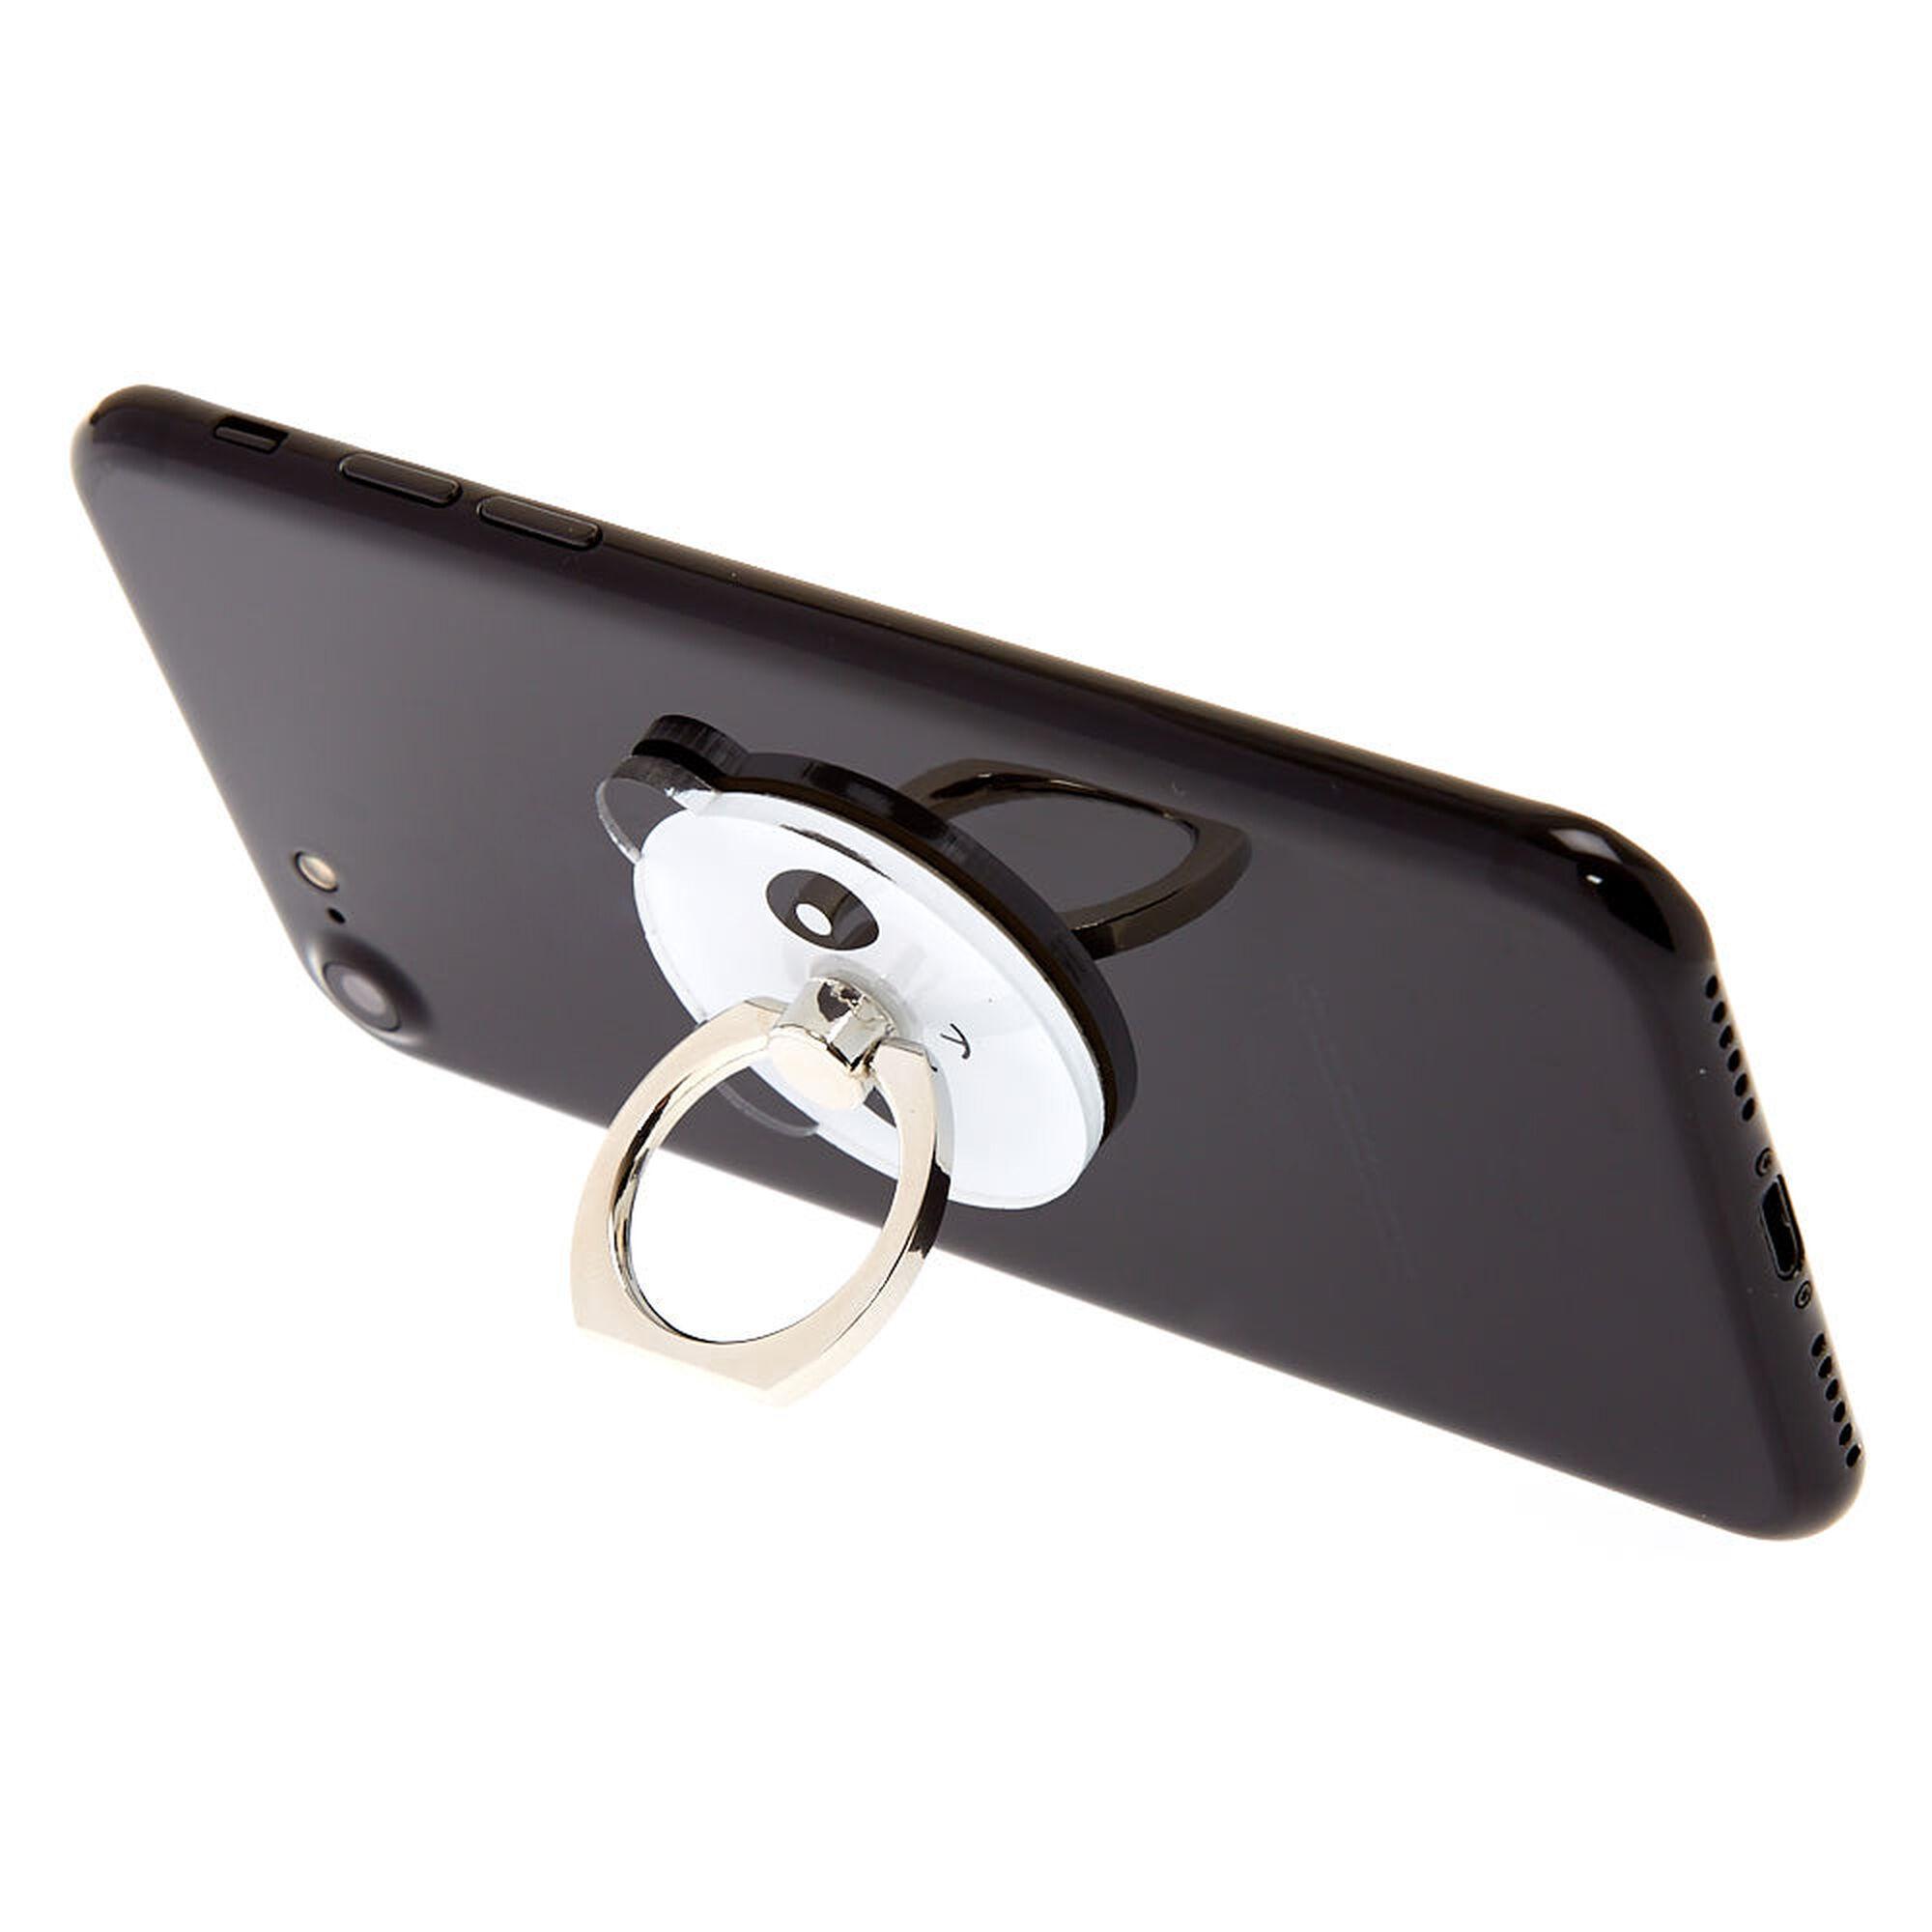 online retailer fc0bb fa8a5 Panda Bear Phone Case Ring Stand